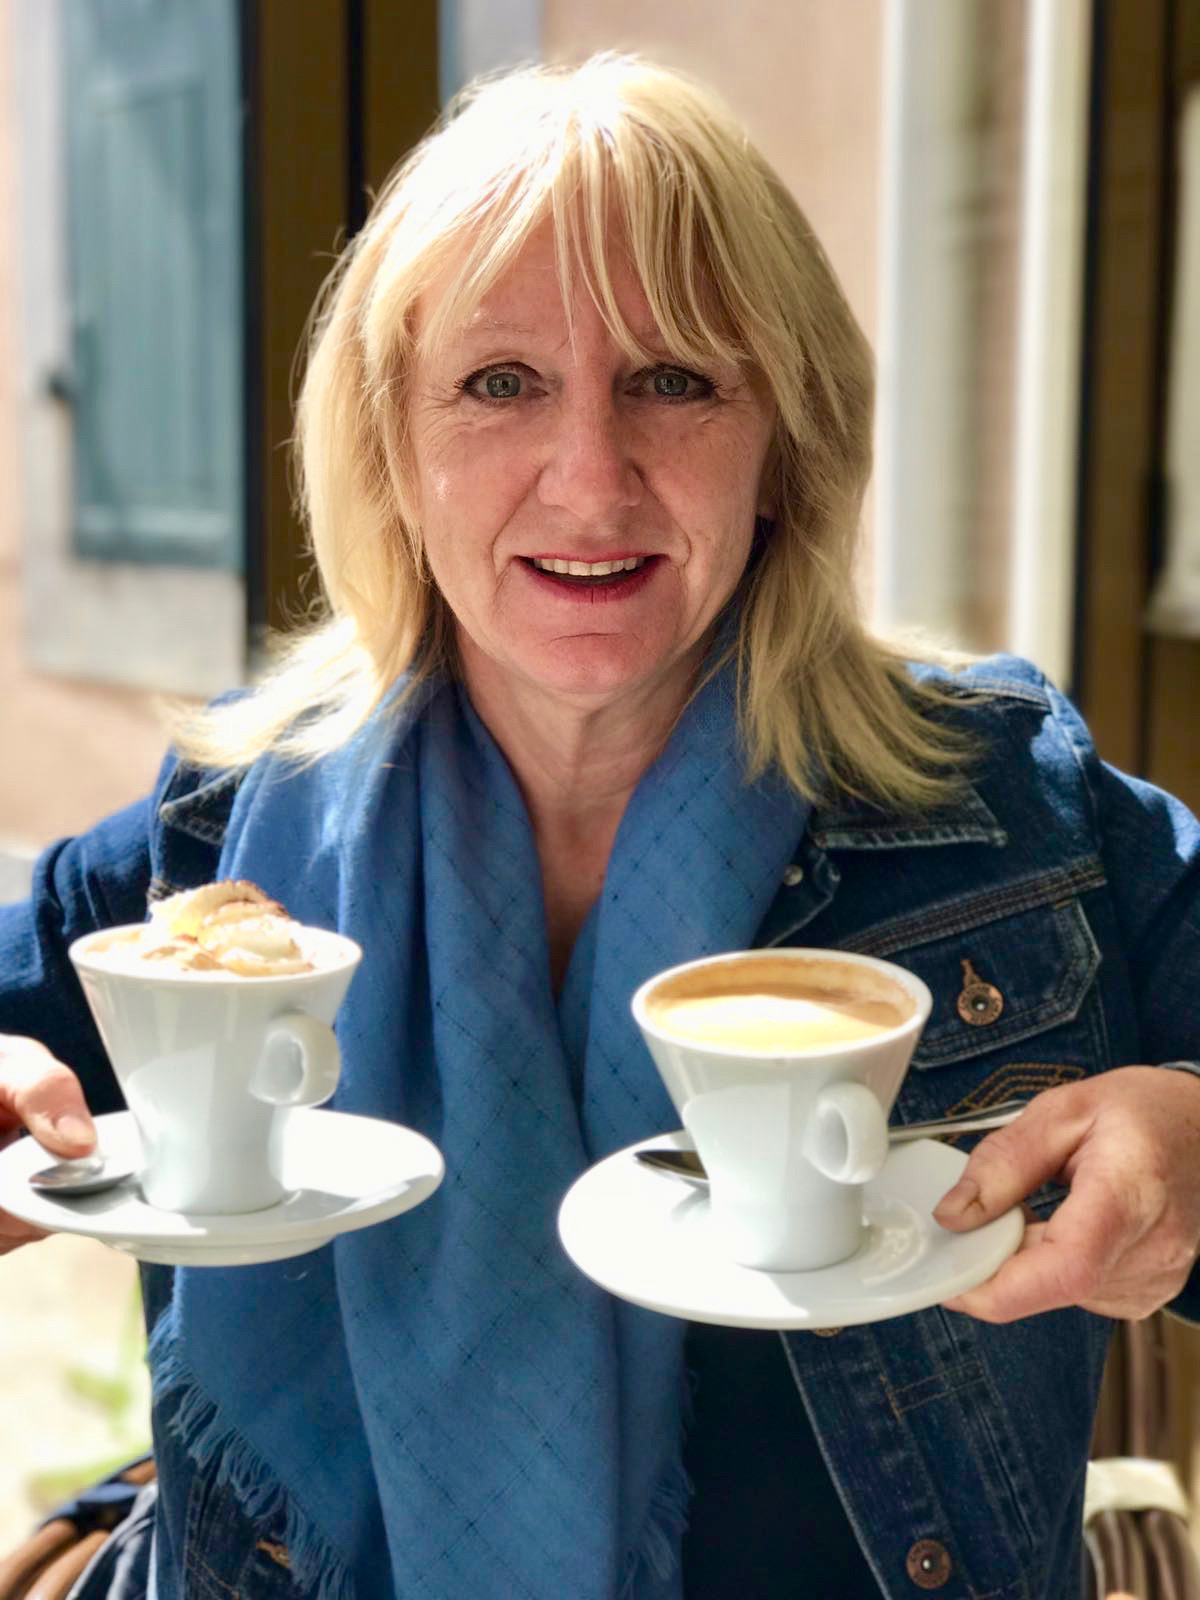 Christine cafe